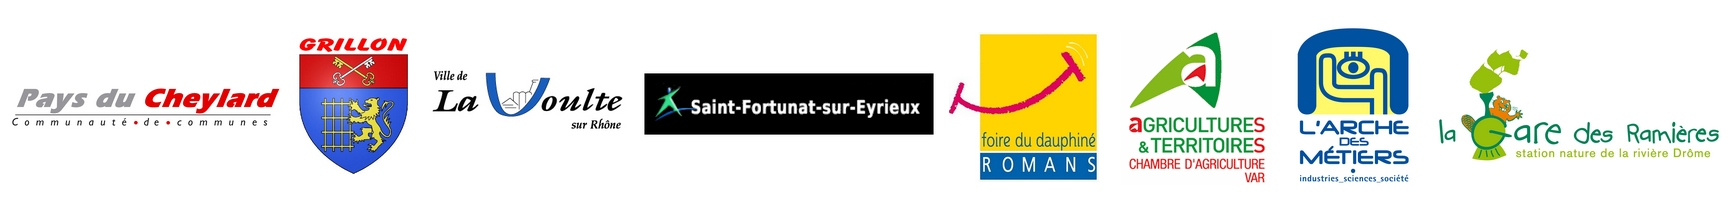 Raphaele Burel Animatrice evenementielle animateur Marseille Aix Avignon Valence